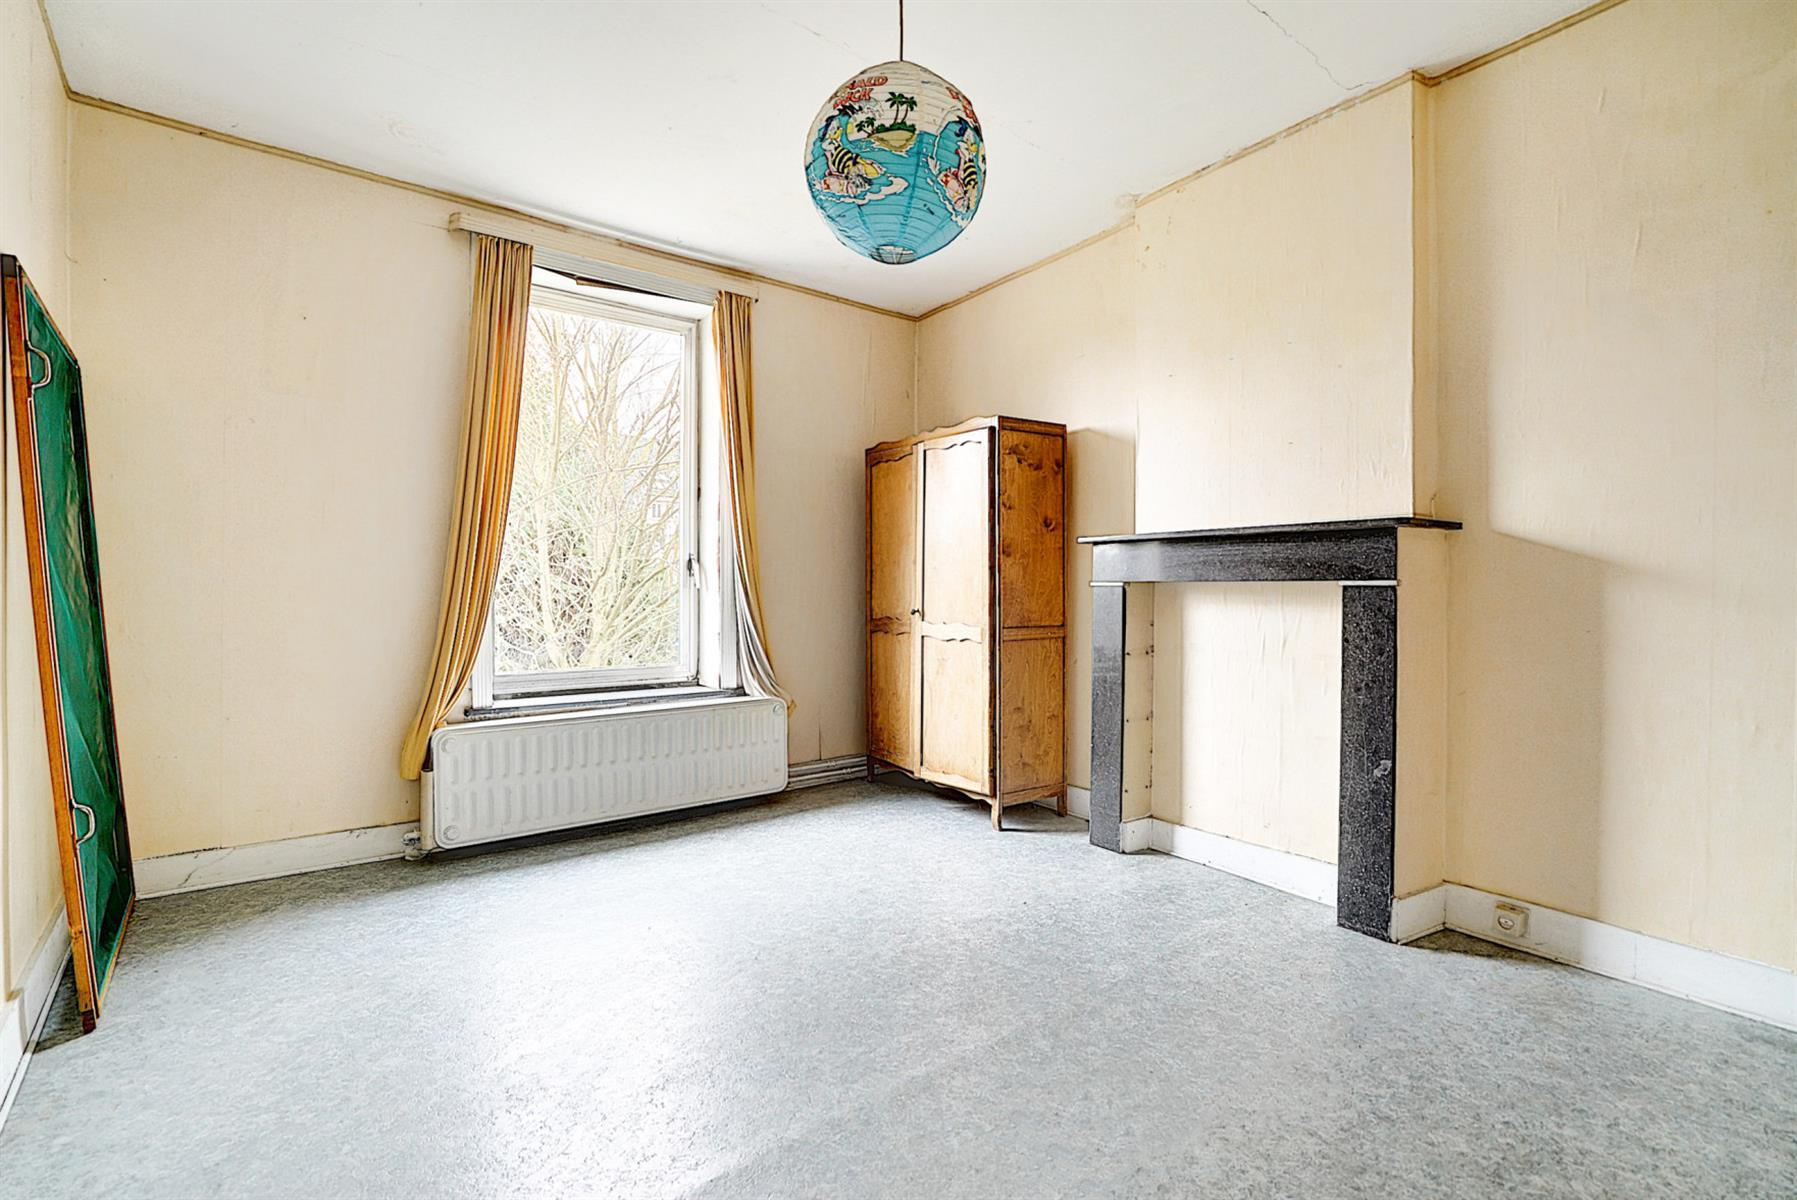 Maison - Ottignies-Louvain-la-Neuve - #4262981-14